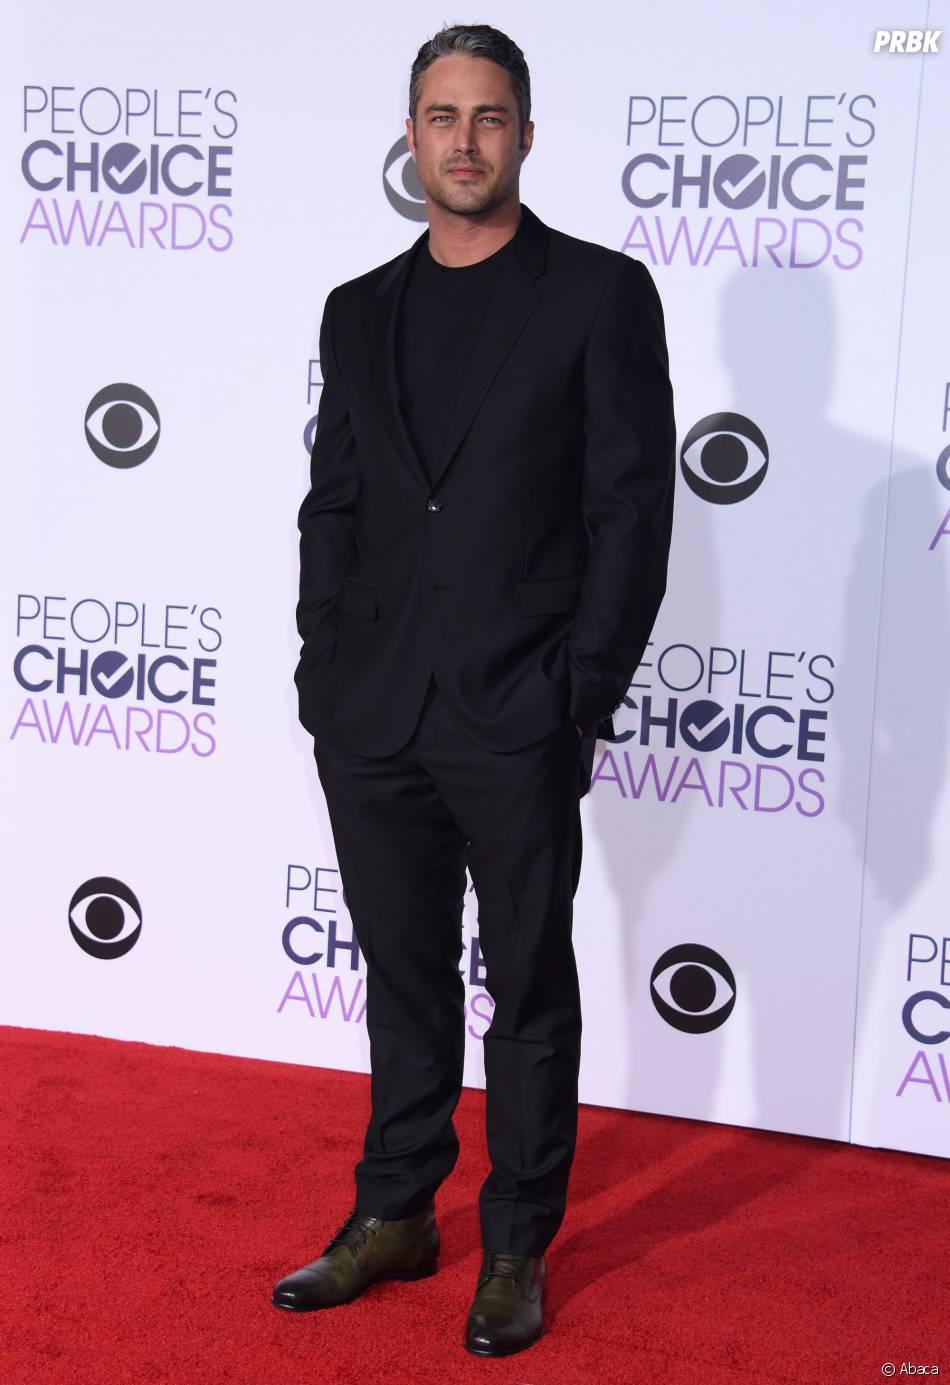 People's Choice Awards 2016 : Taylor Kinneysur le tapis rouge le 6 janvier